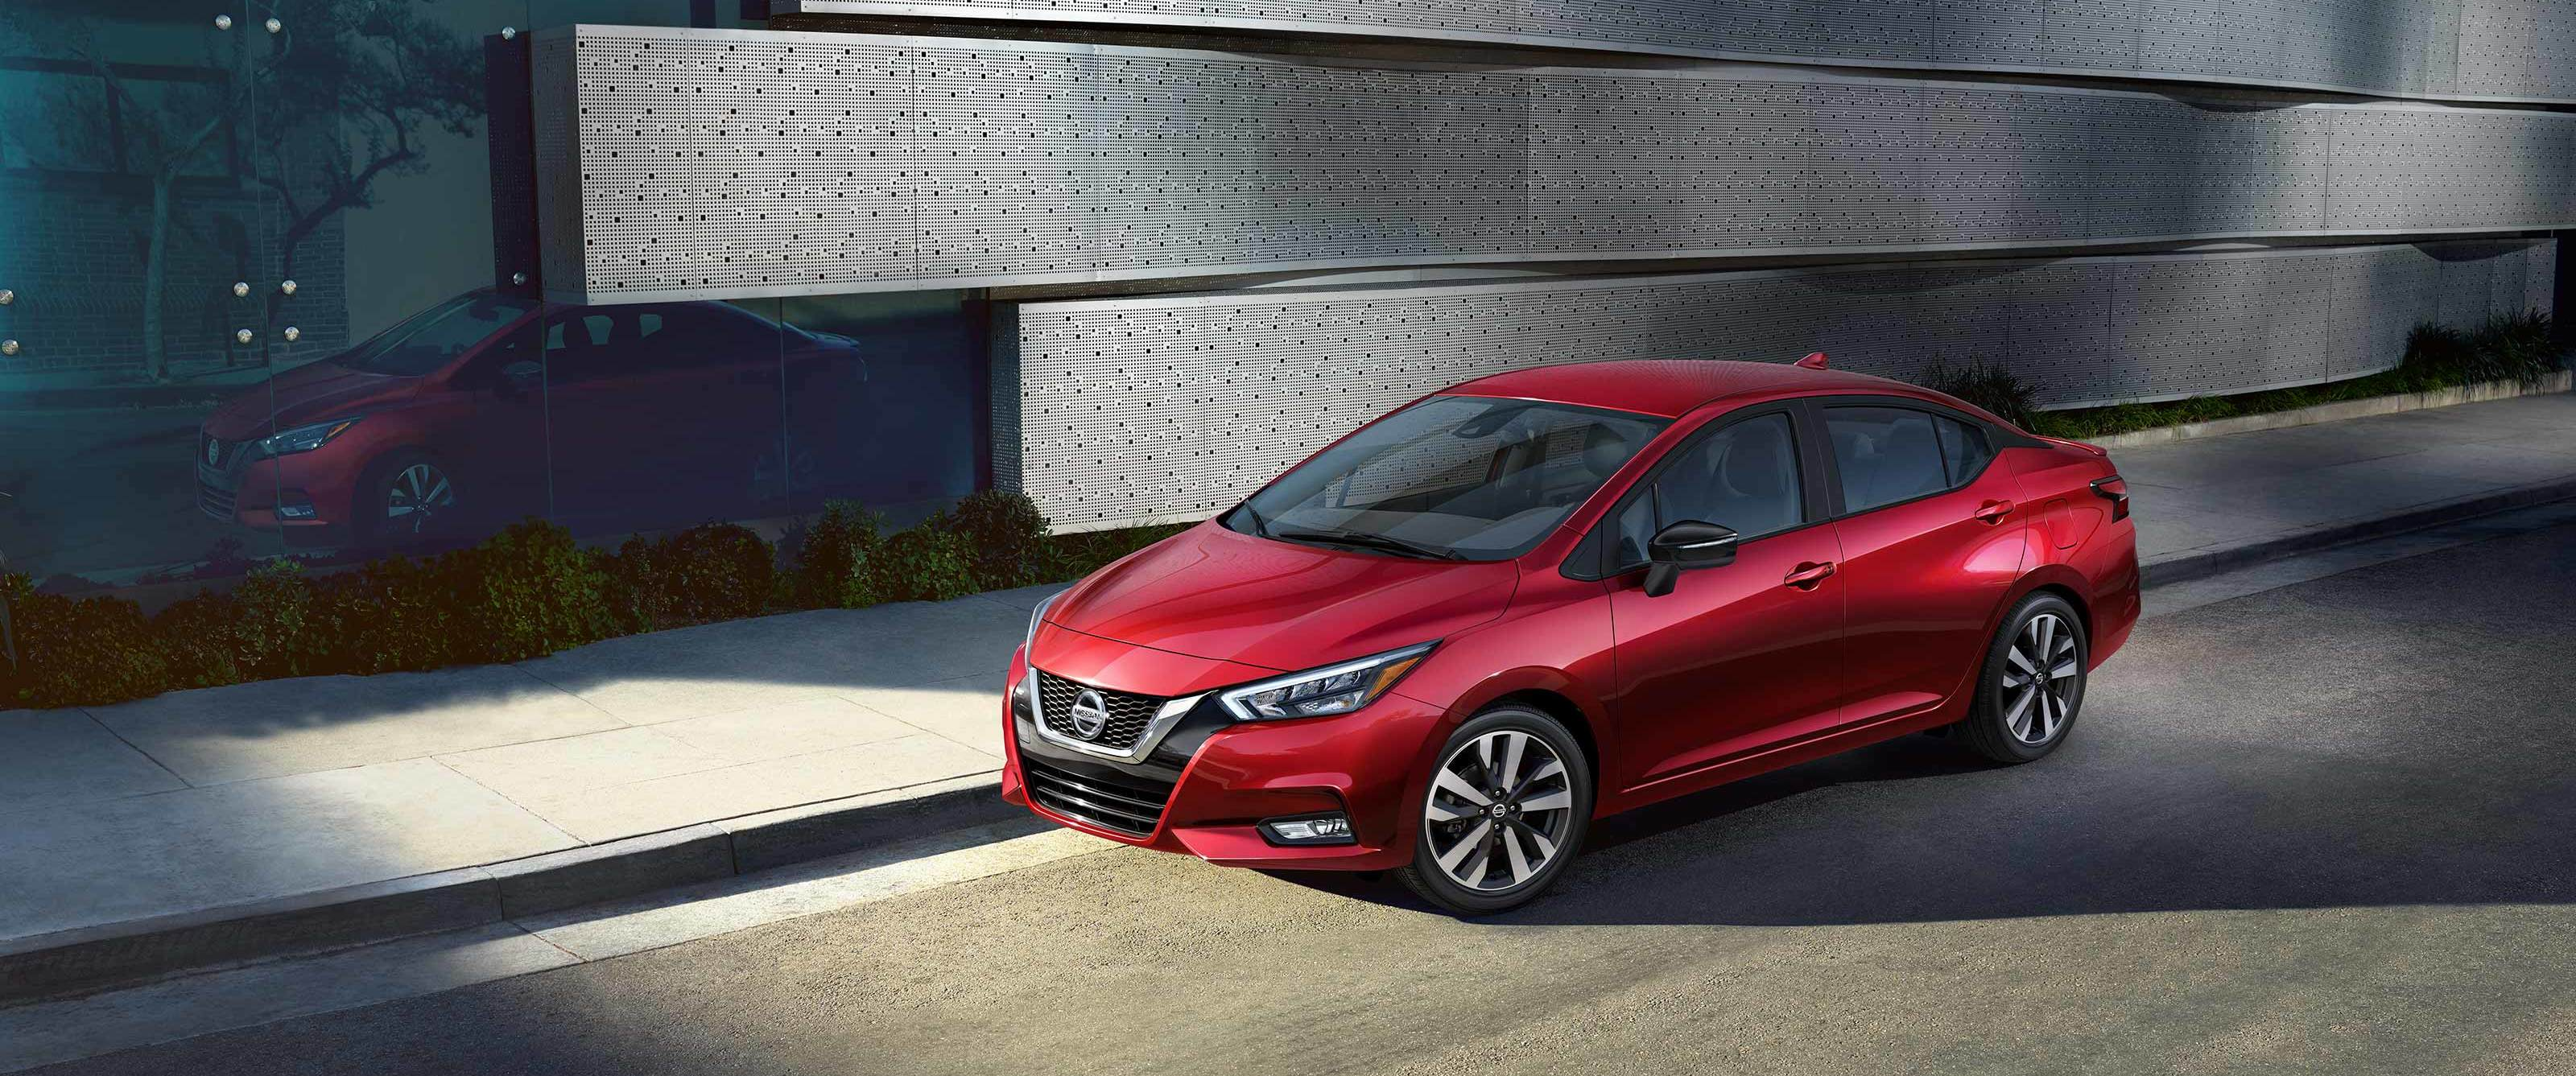 2020 Nissan Versa Leasing near Manassas, VA